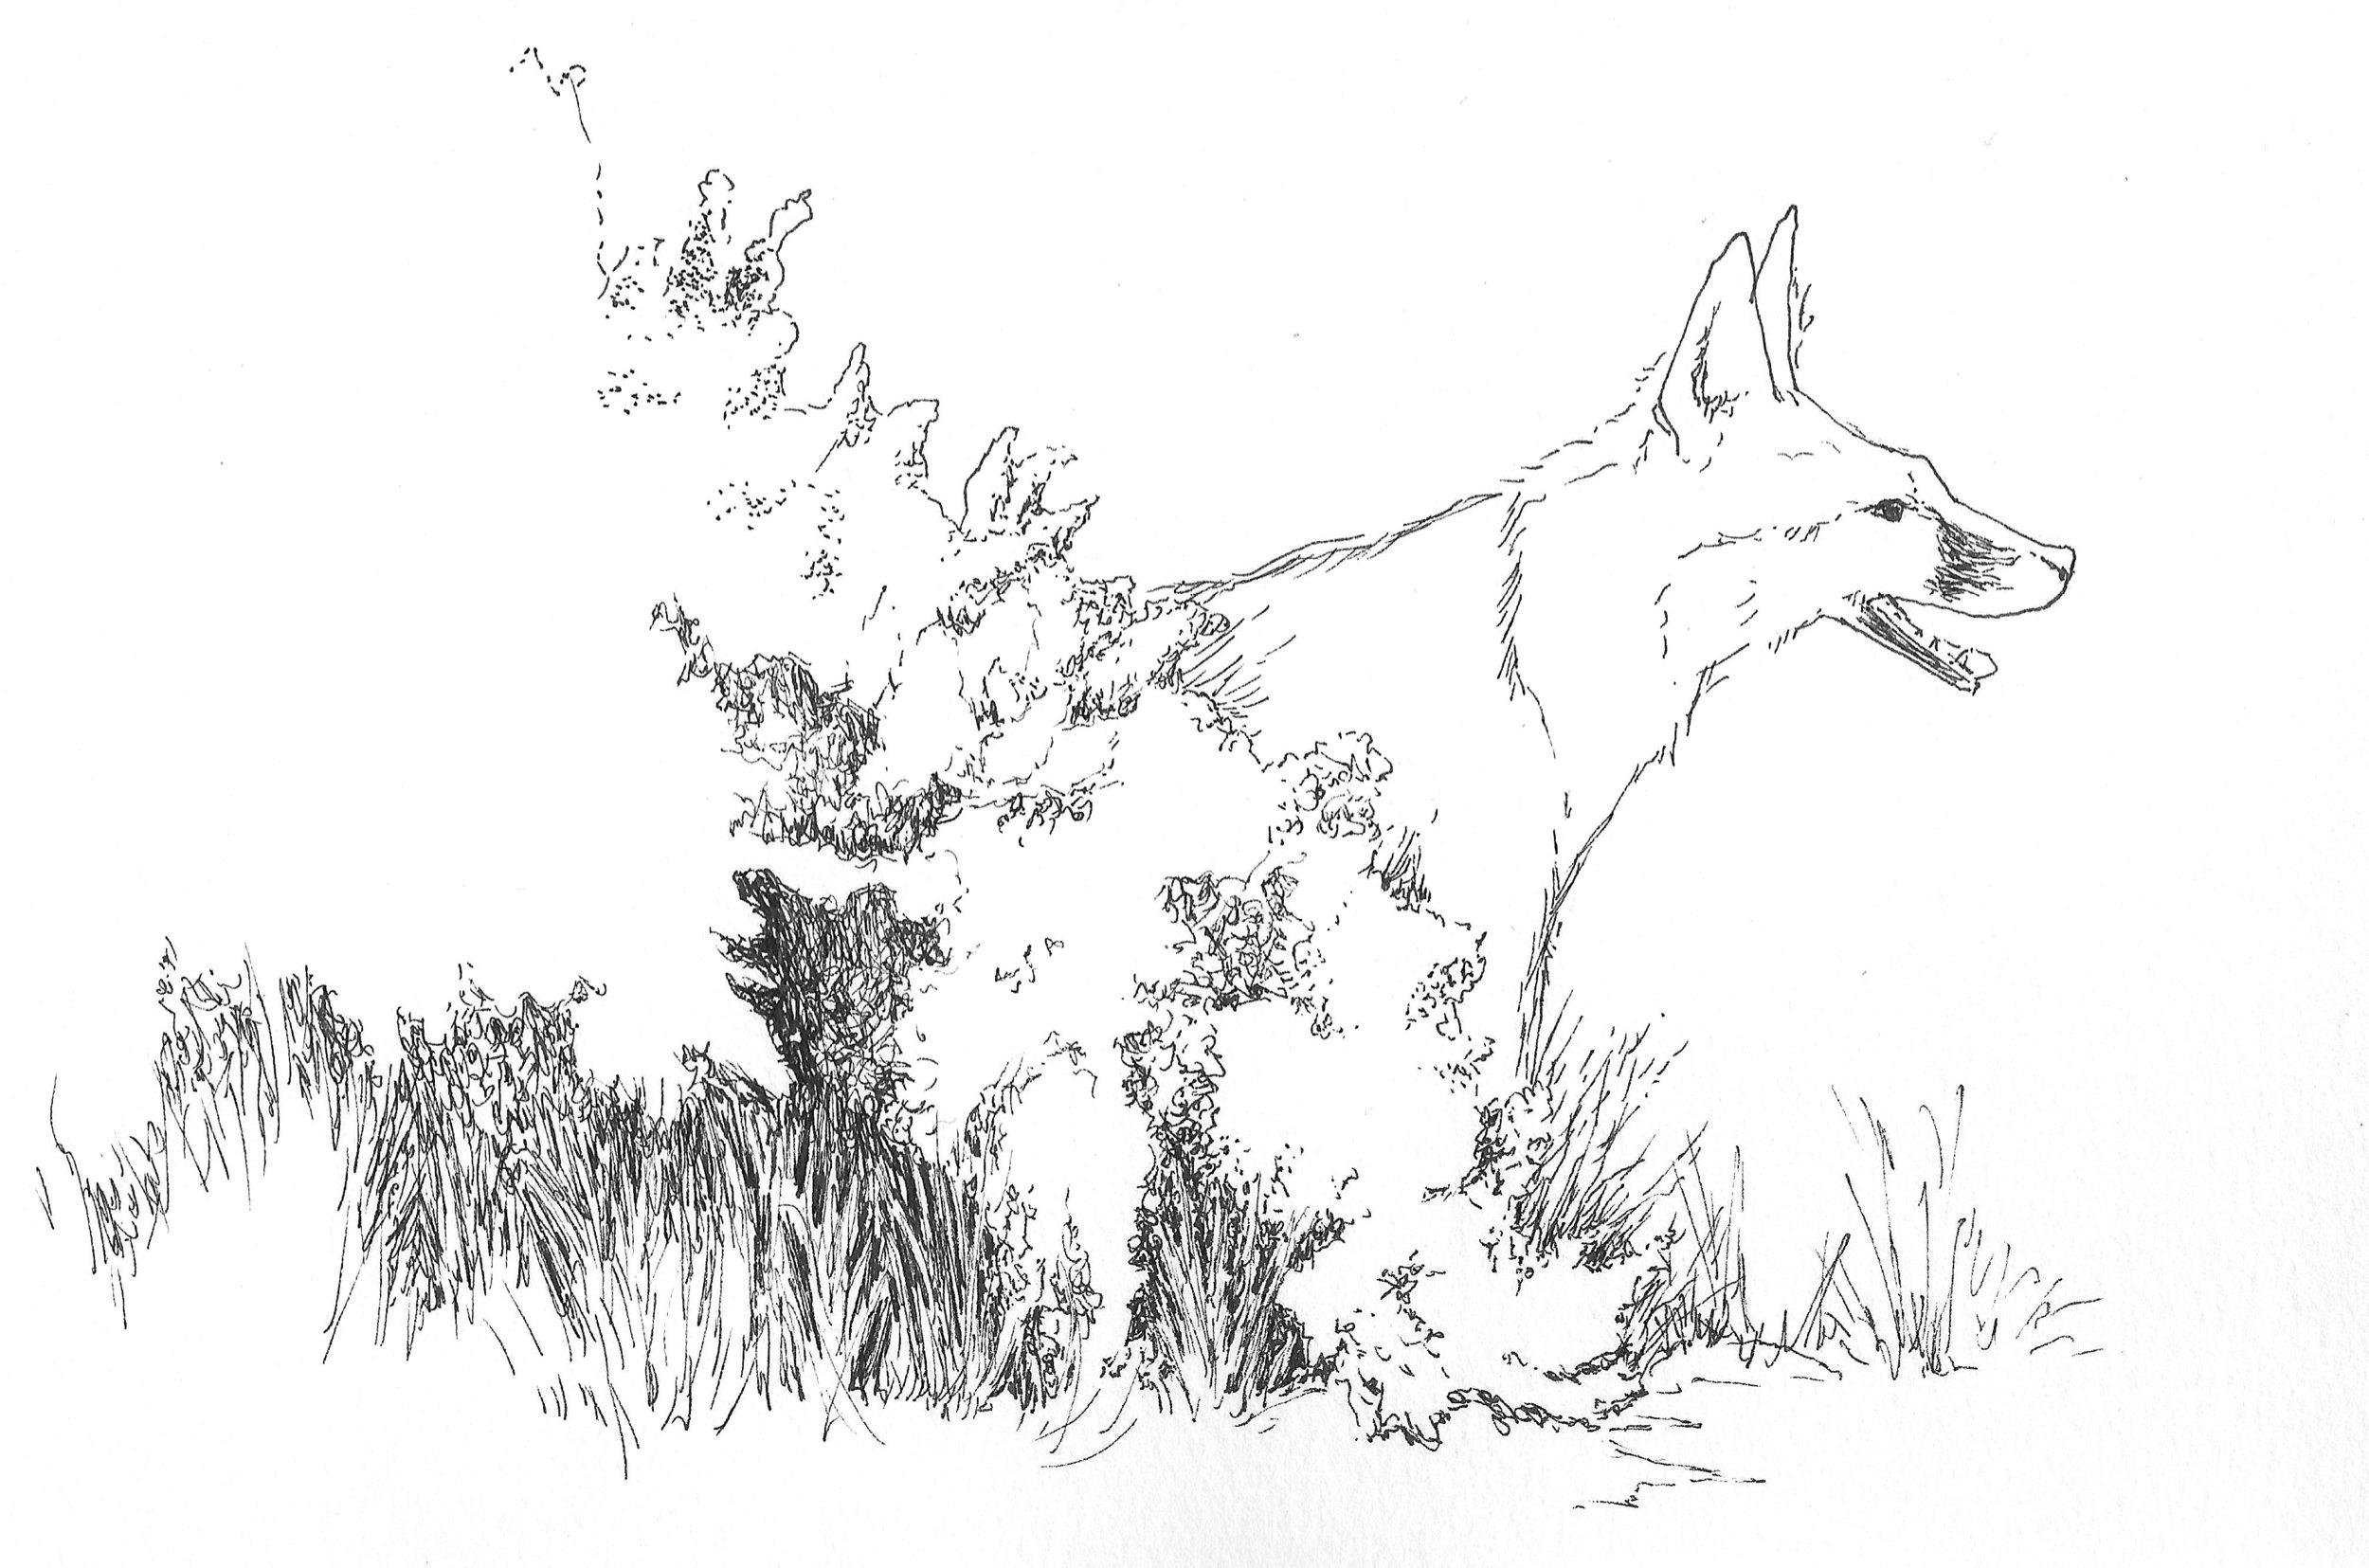 Fox in a Coyote Brush-2.jpg